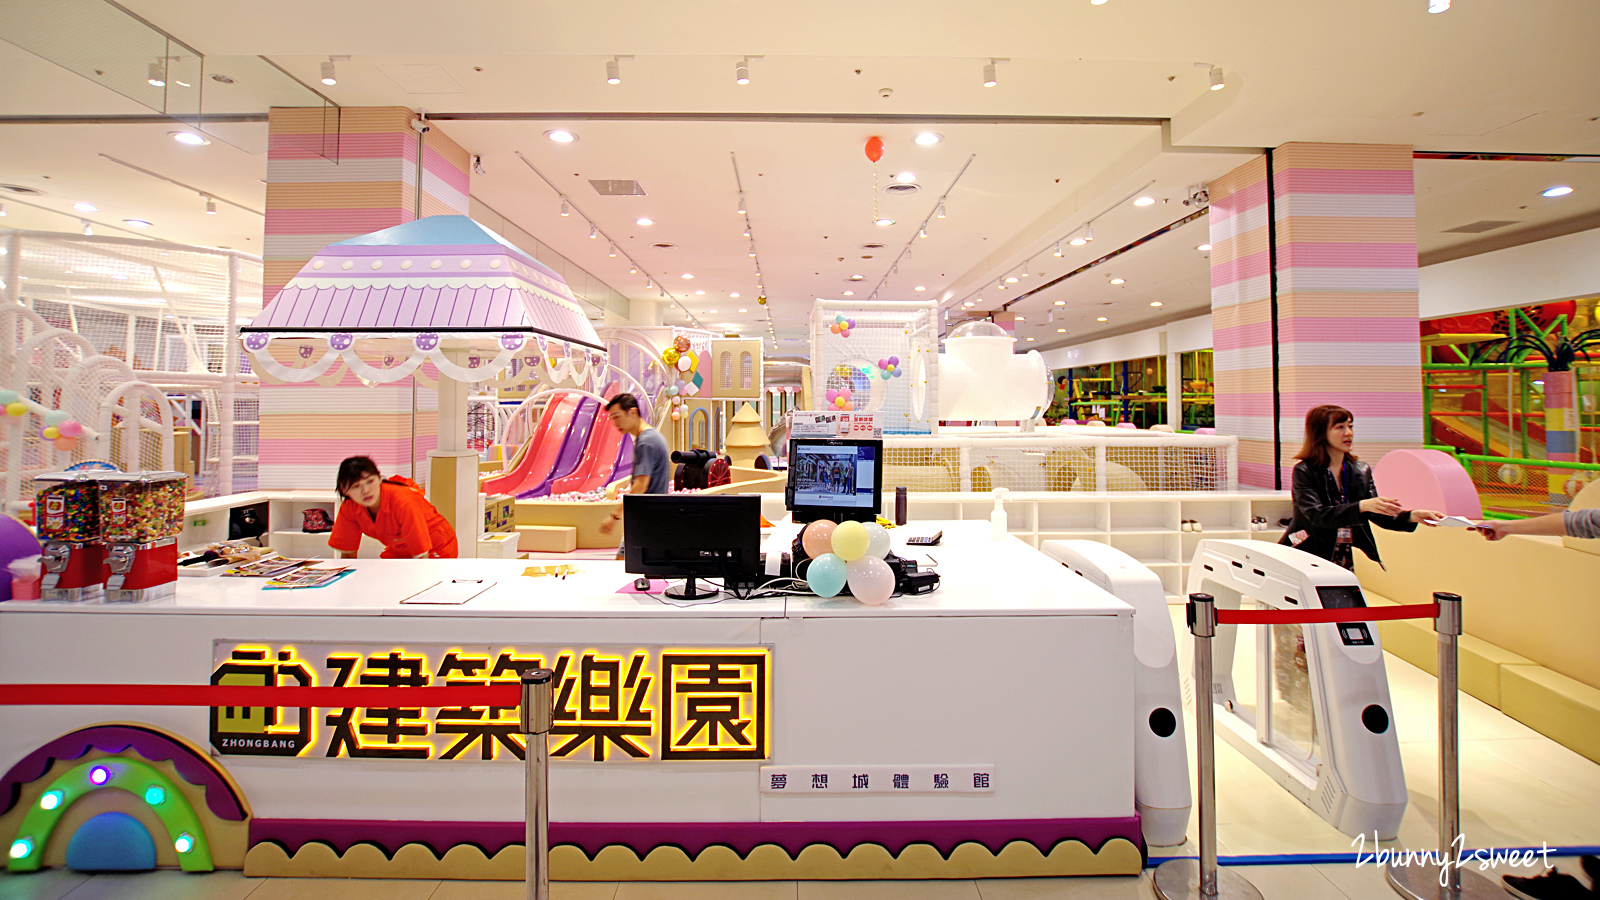 2019-0921-Kids 建築樂園 夢想城體驗館-01.jpg